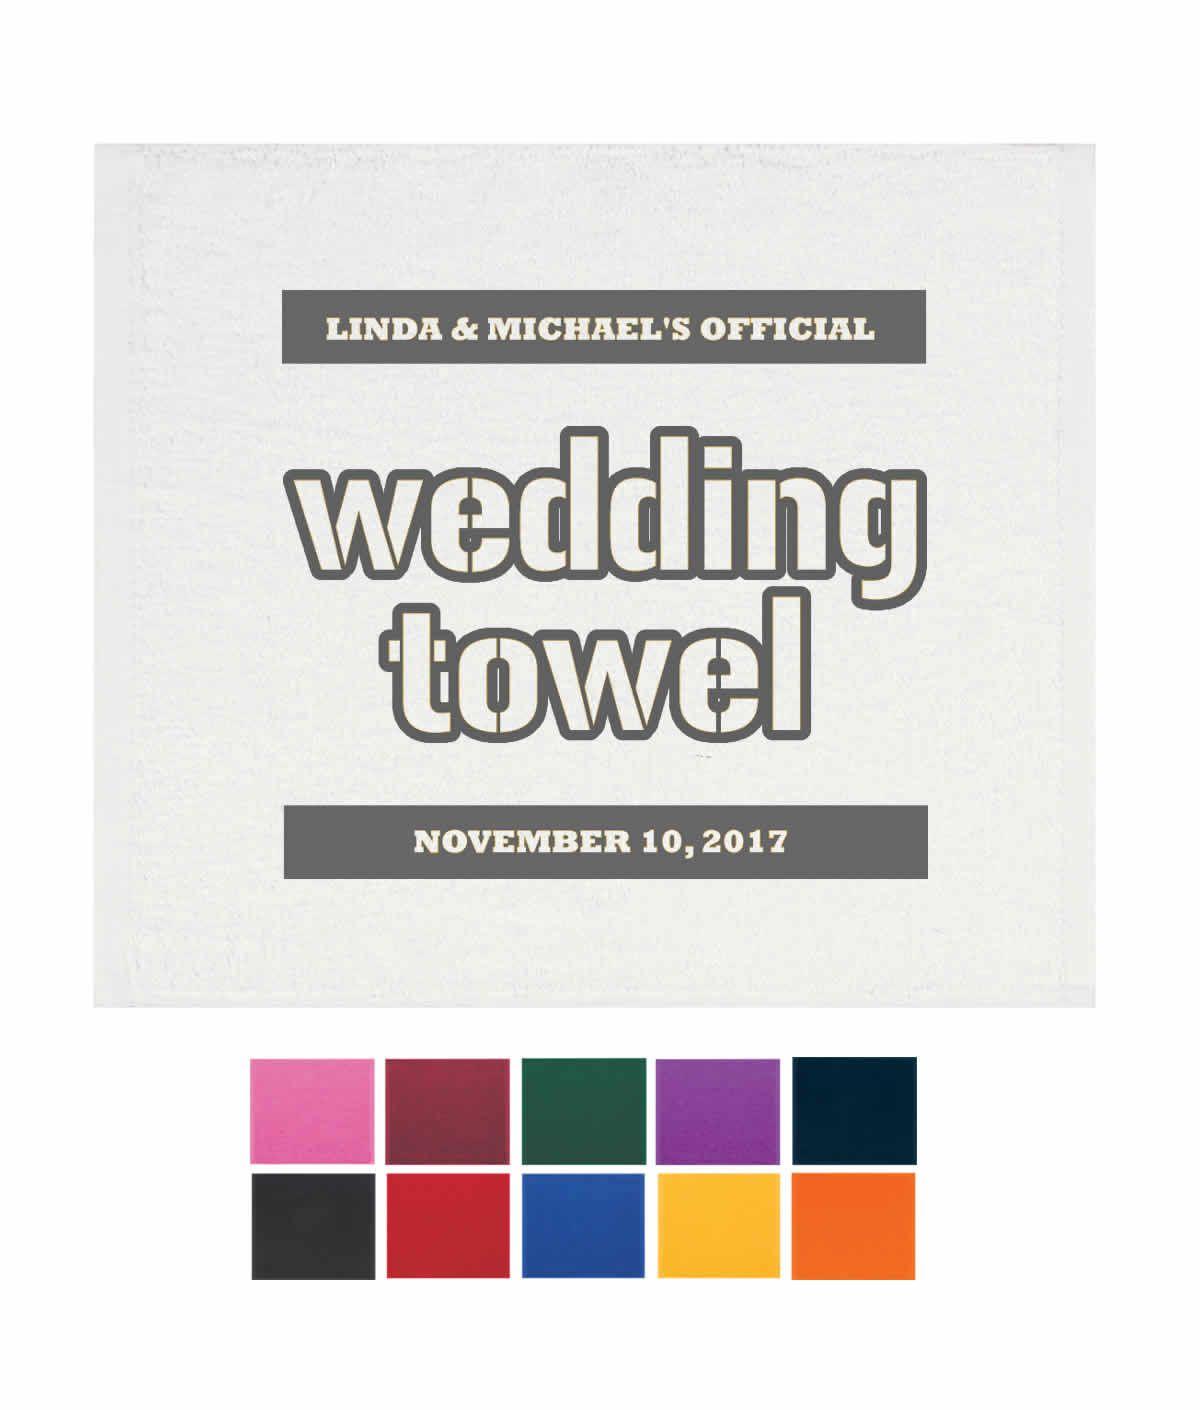 Wedding Rally Towel – FREE Proofs | winter wedding ideas, winter ...